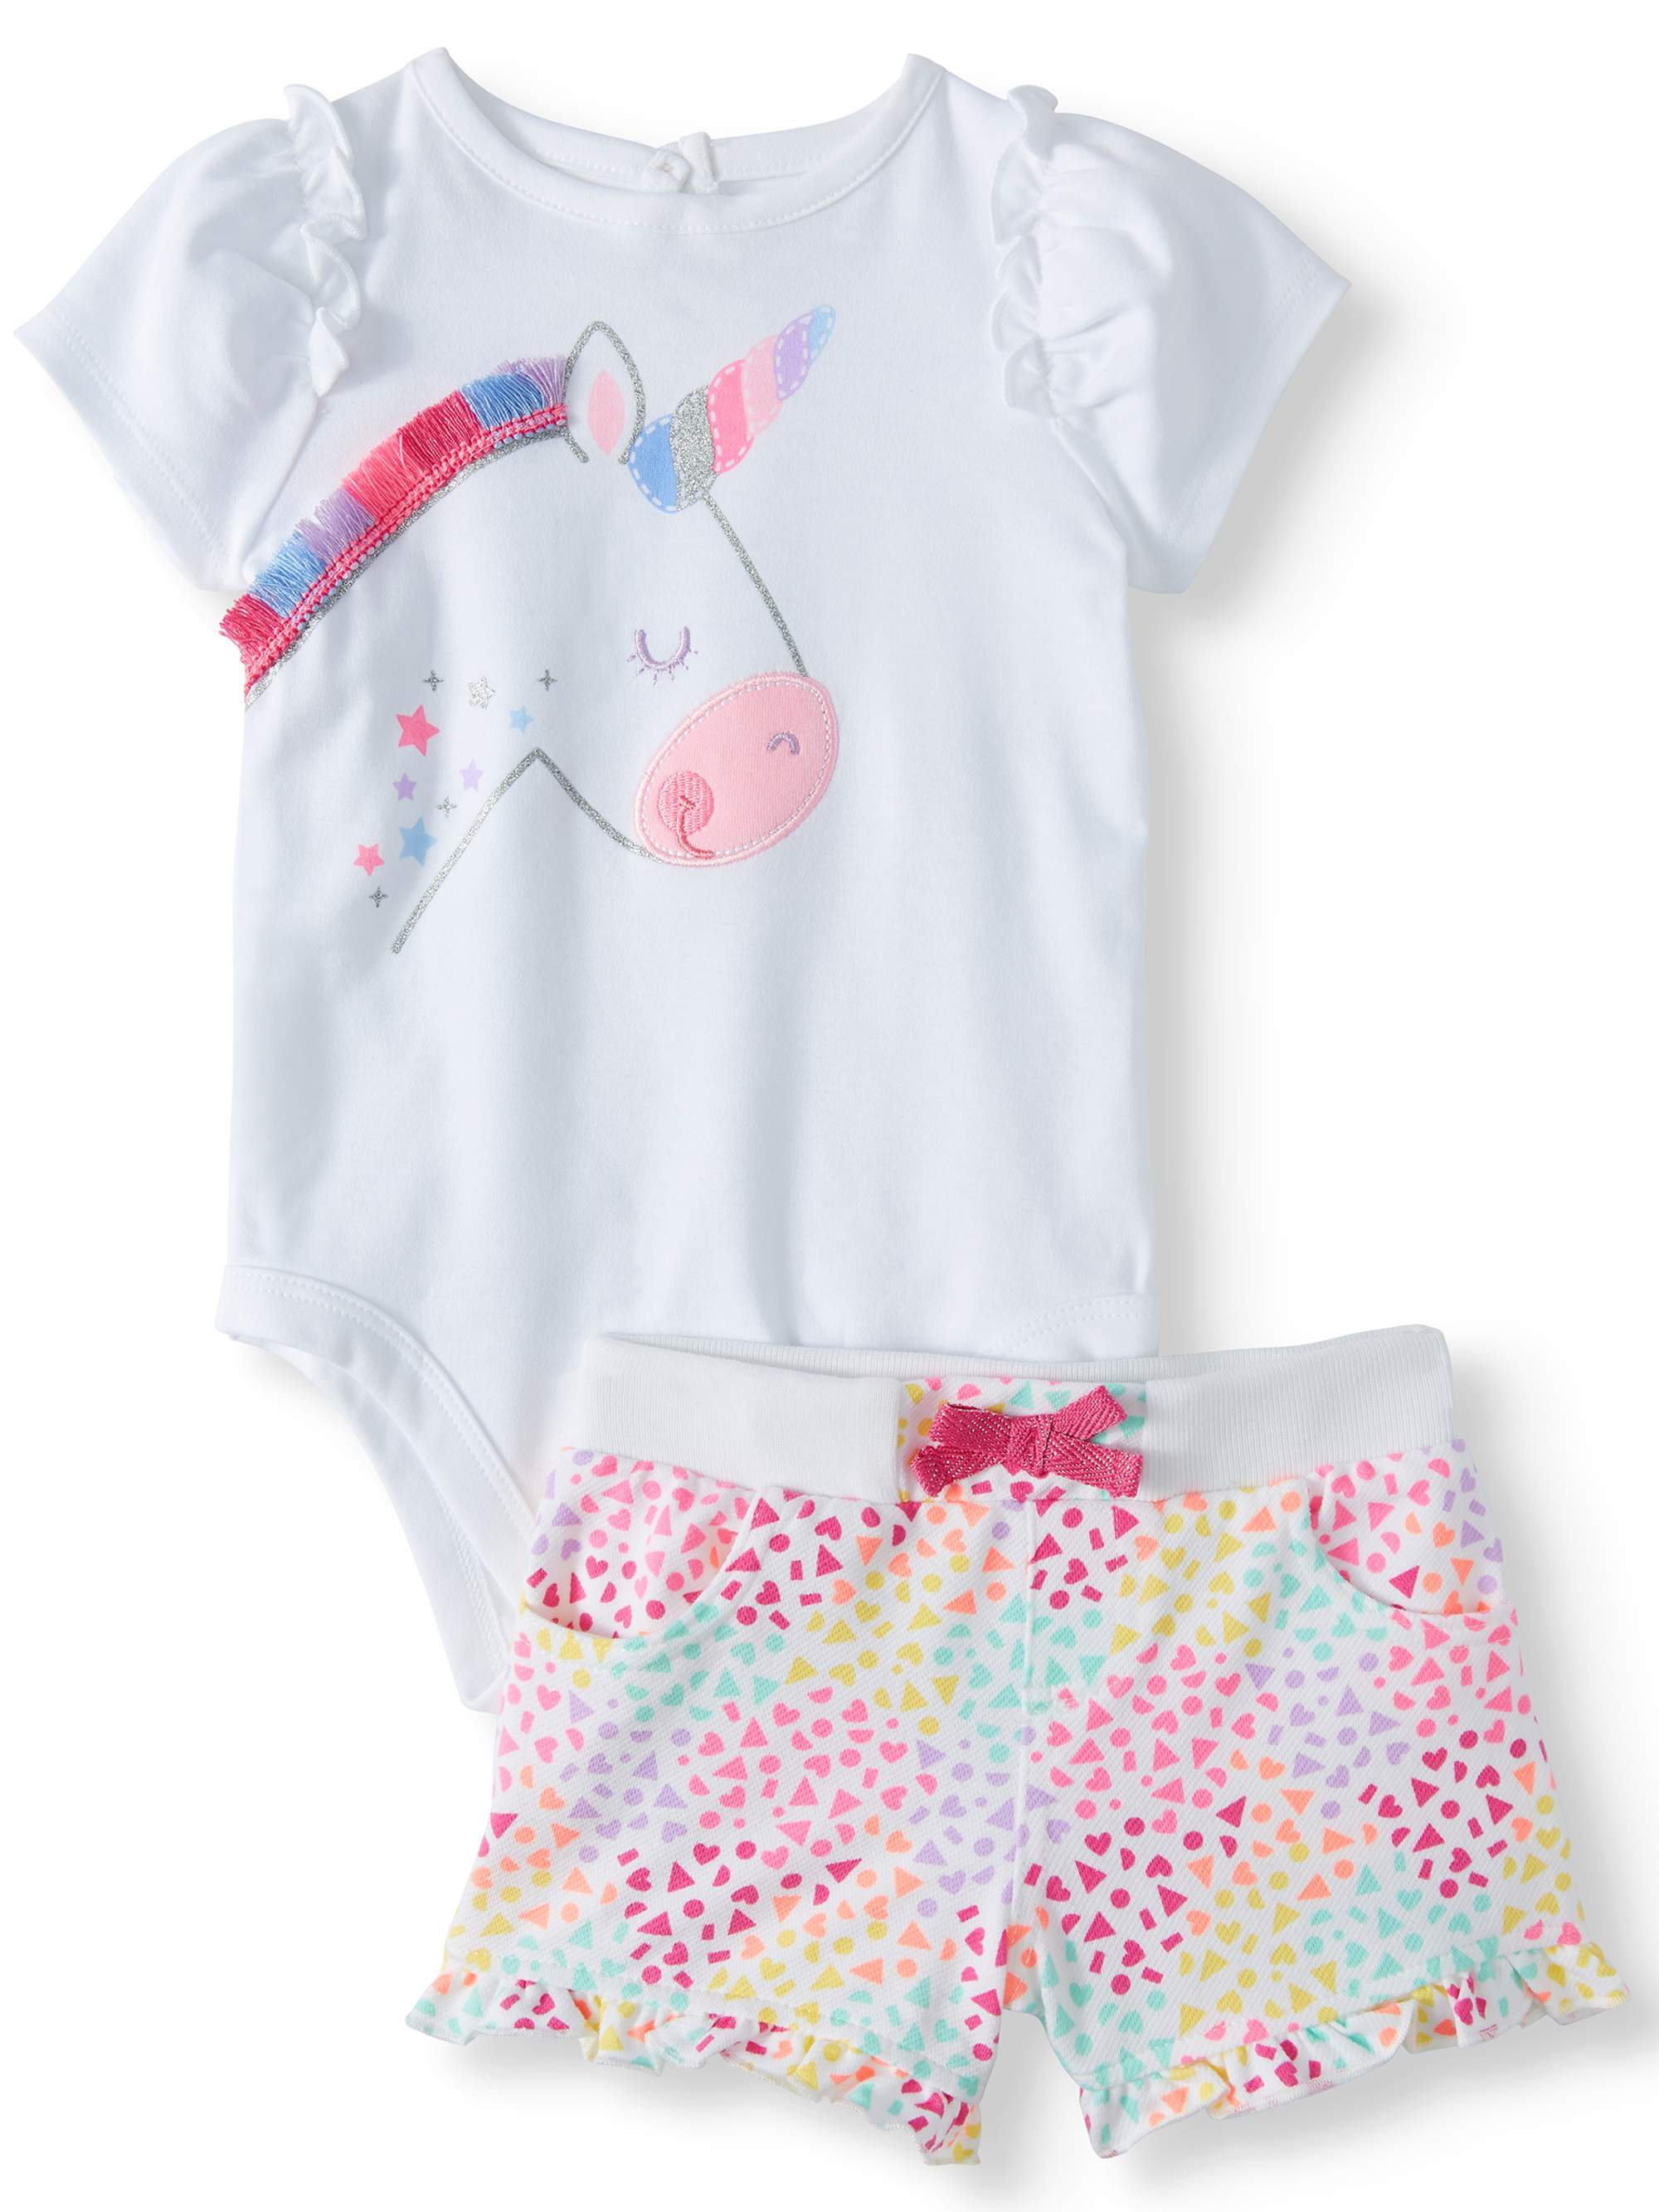 Girls' Clothing (newborn-5t) Useful Garanimals Owl Bodysuit 6-9m Baby & Toddler Clothing